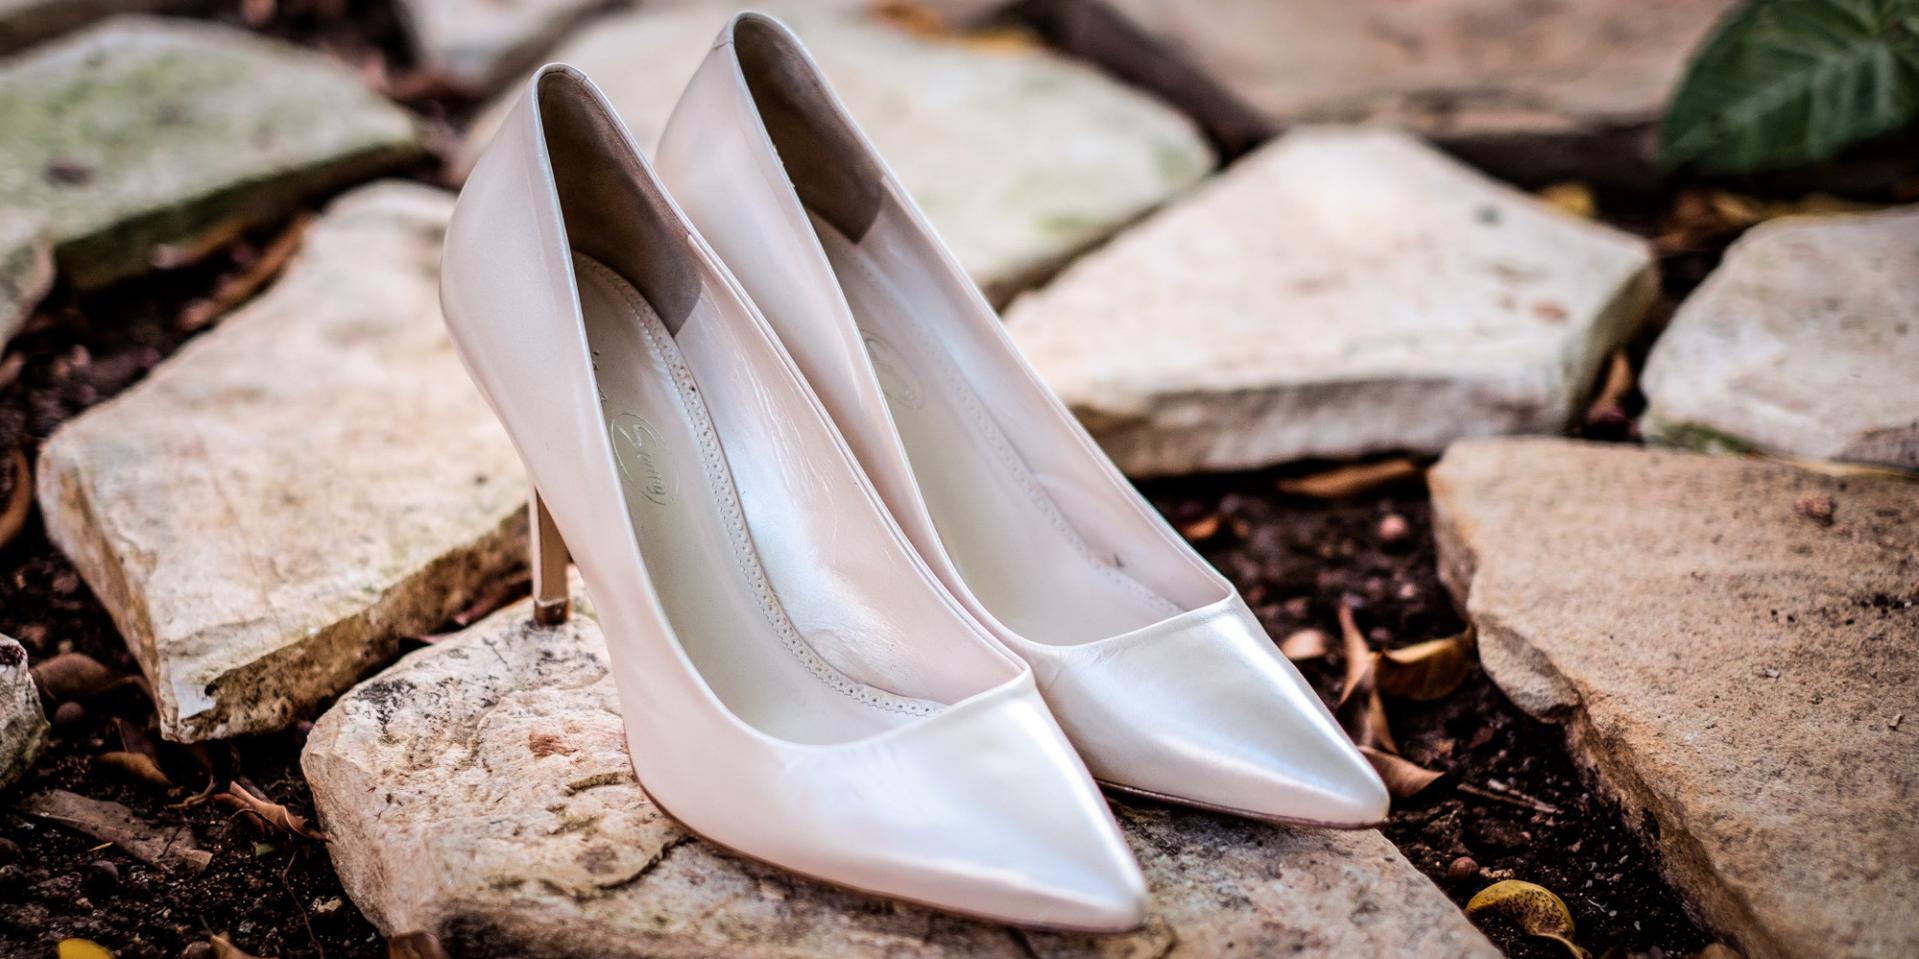 bodas-sin-clasificar-sin-tema-cuba-27511.jpg